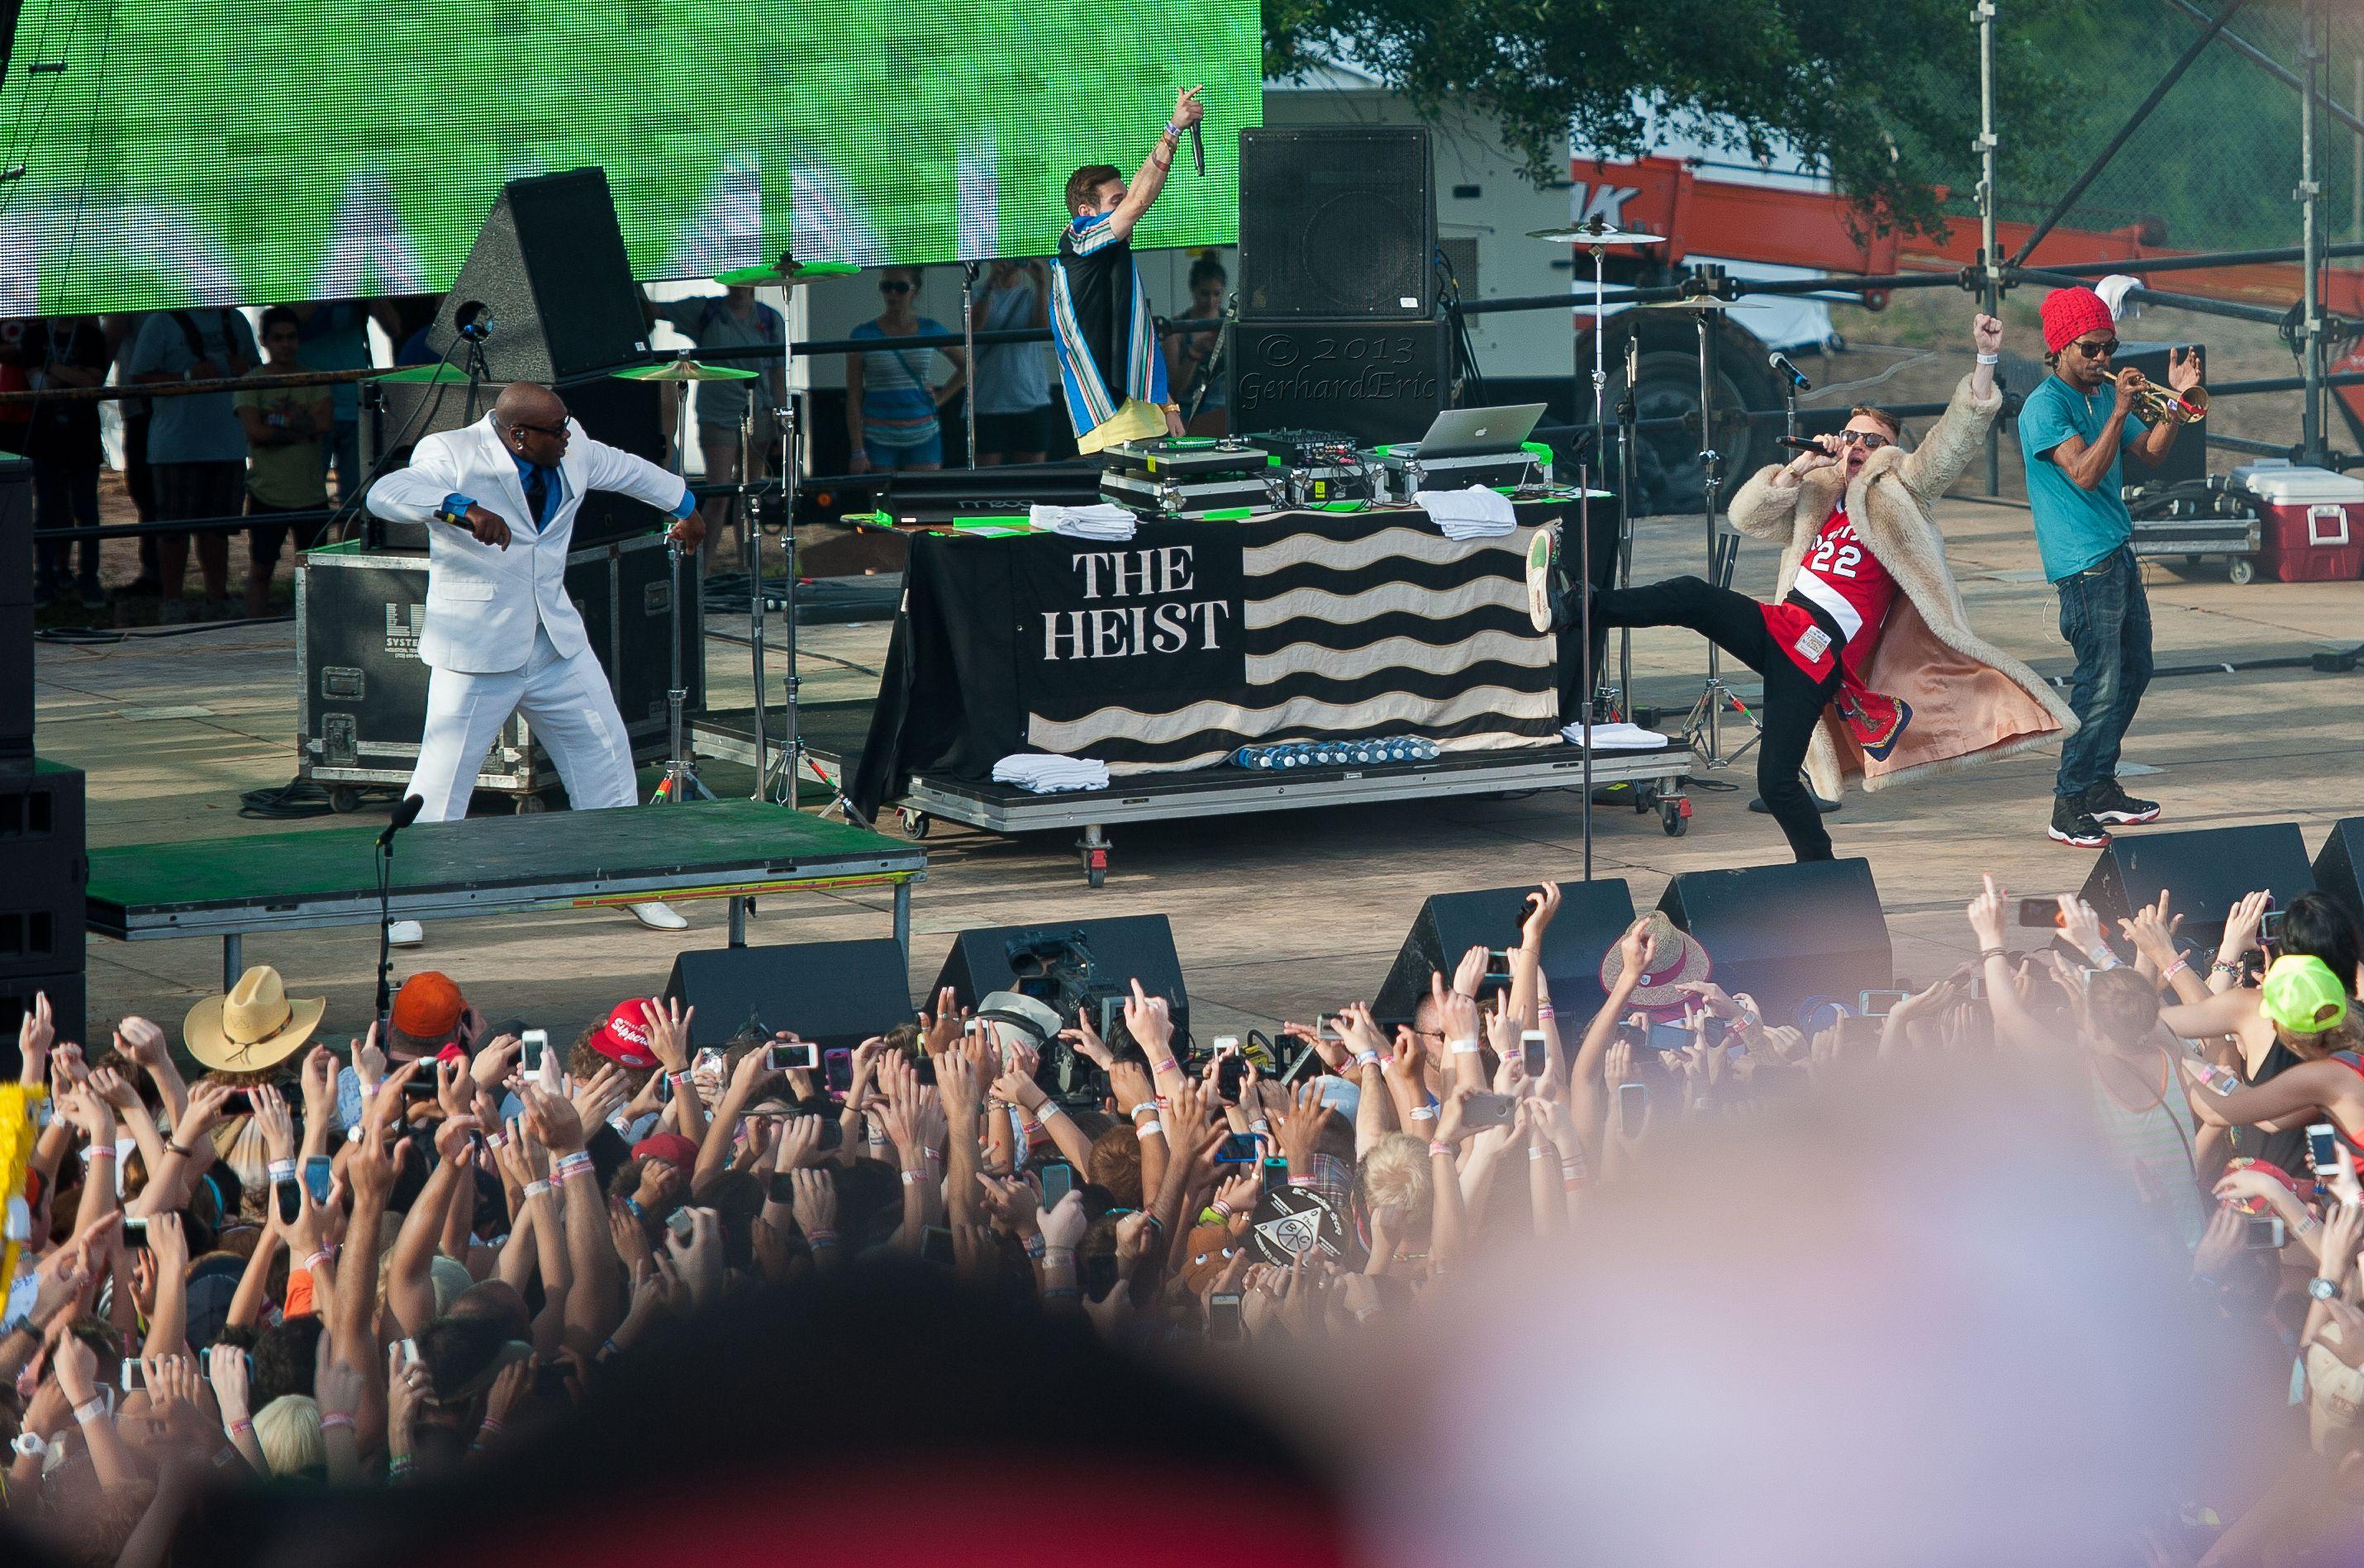 Macklemore and Ryan Lewis - Houston, TX Free Press Summer Fest 2013 / taken by GerhardEric